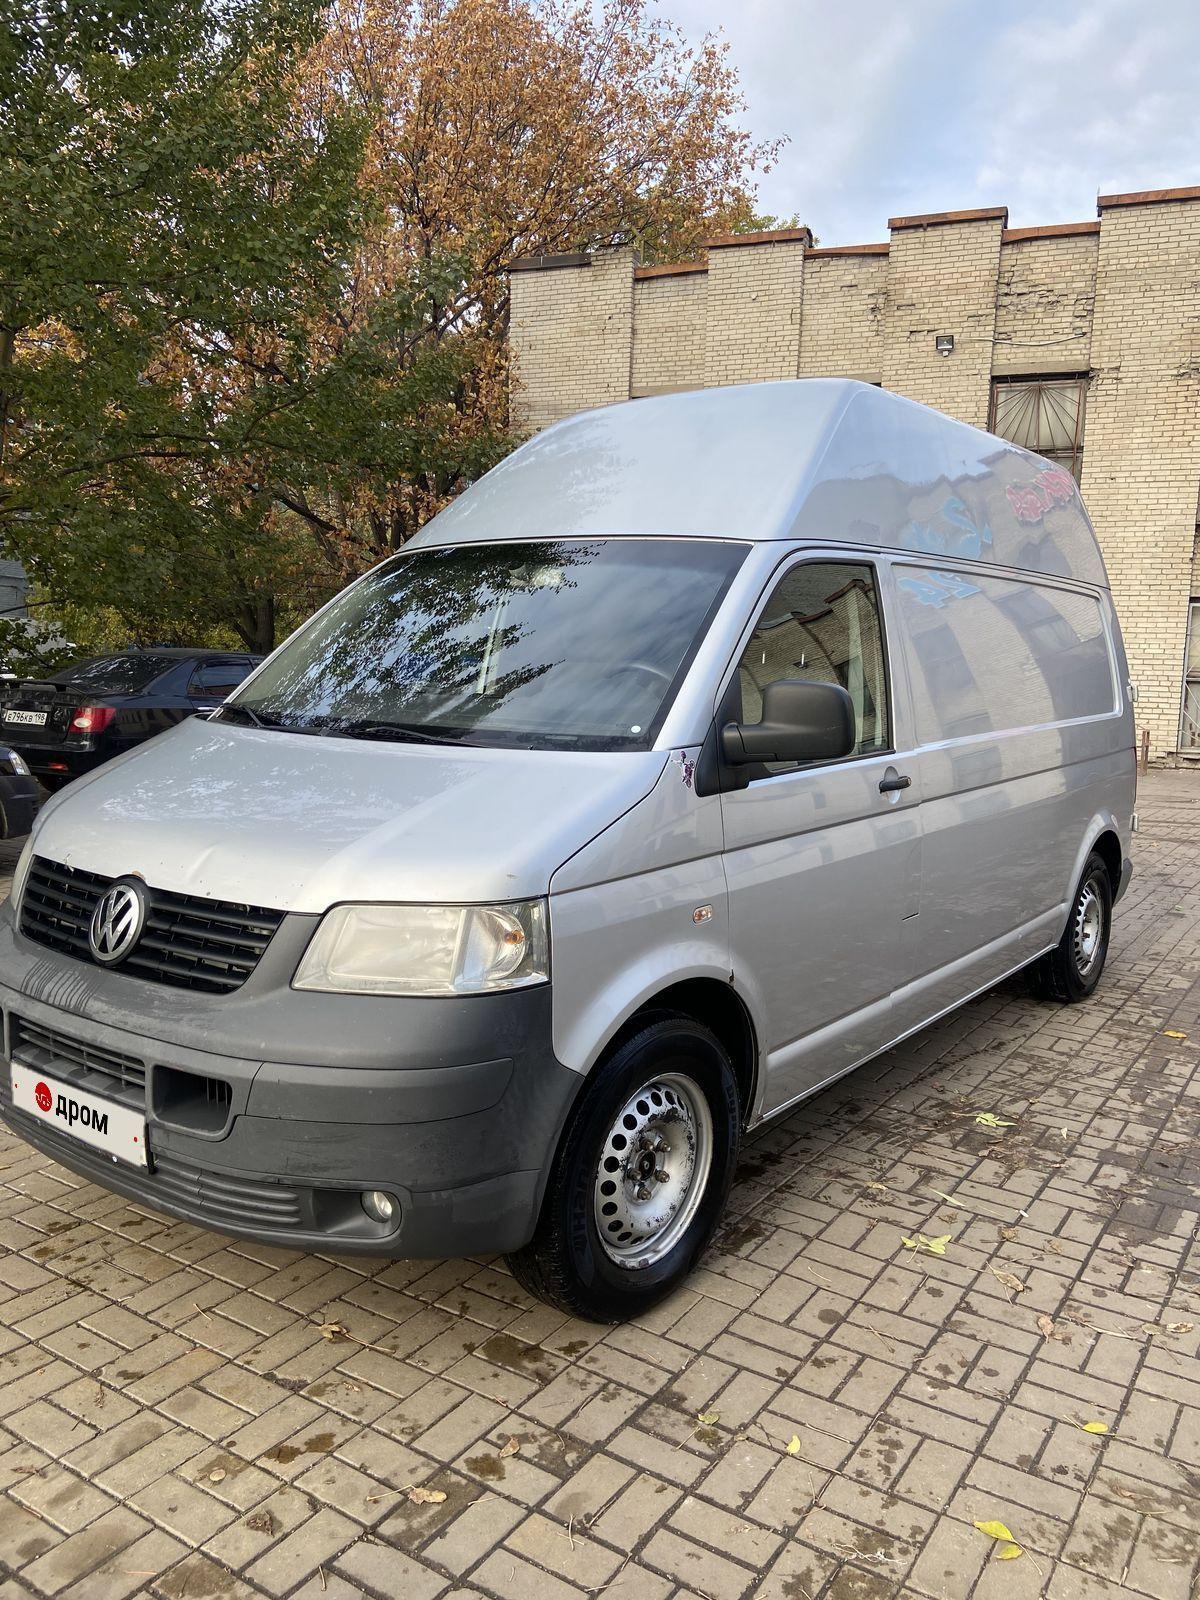 Авто транспортер санкт петербург элеваторы казахстане